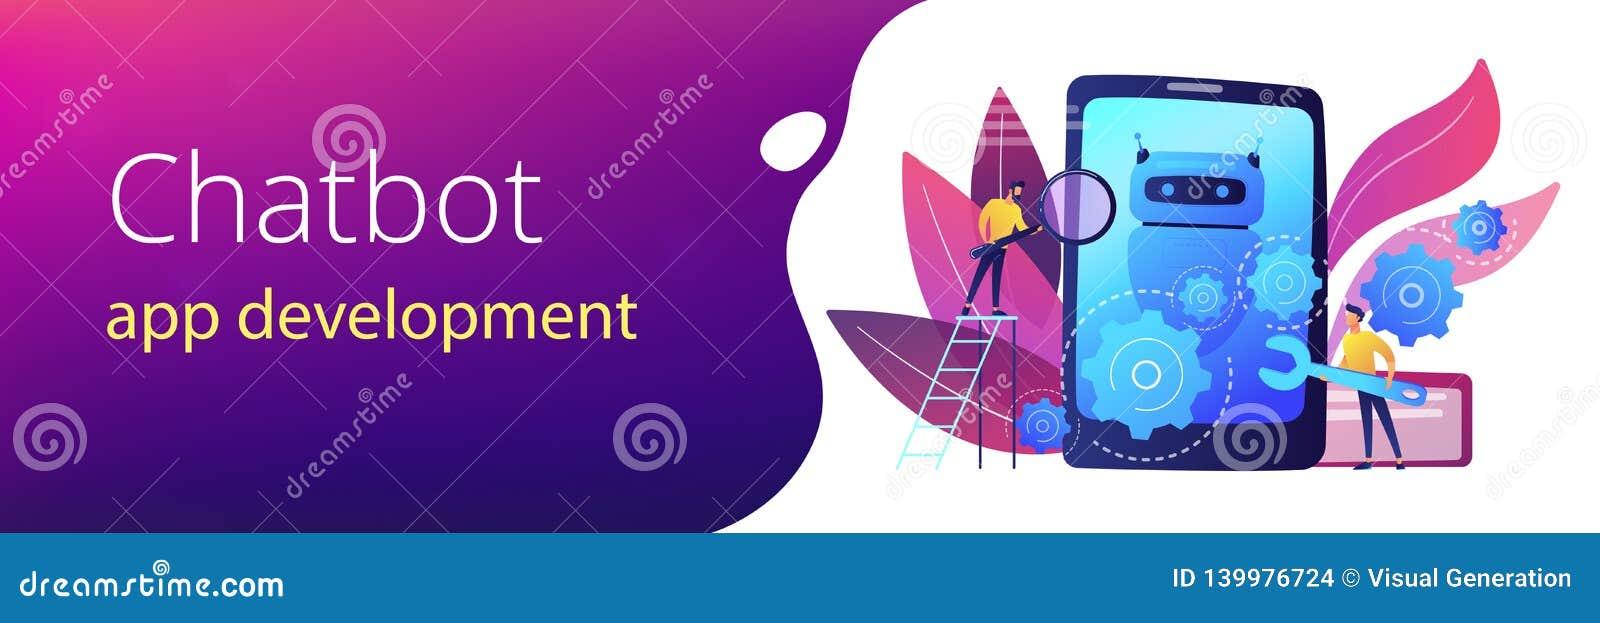 Chatbot App Development Concept Banner Header  Stock Vector